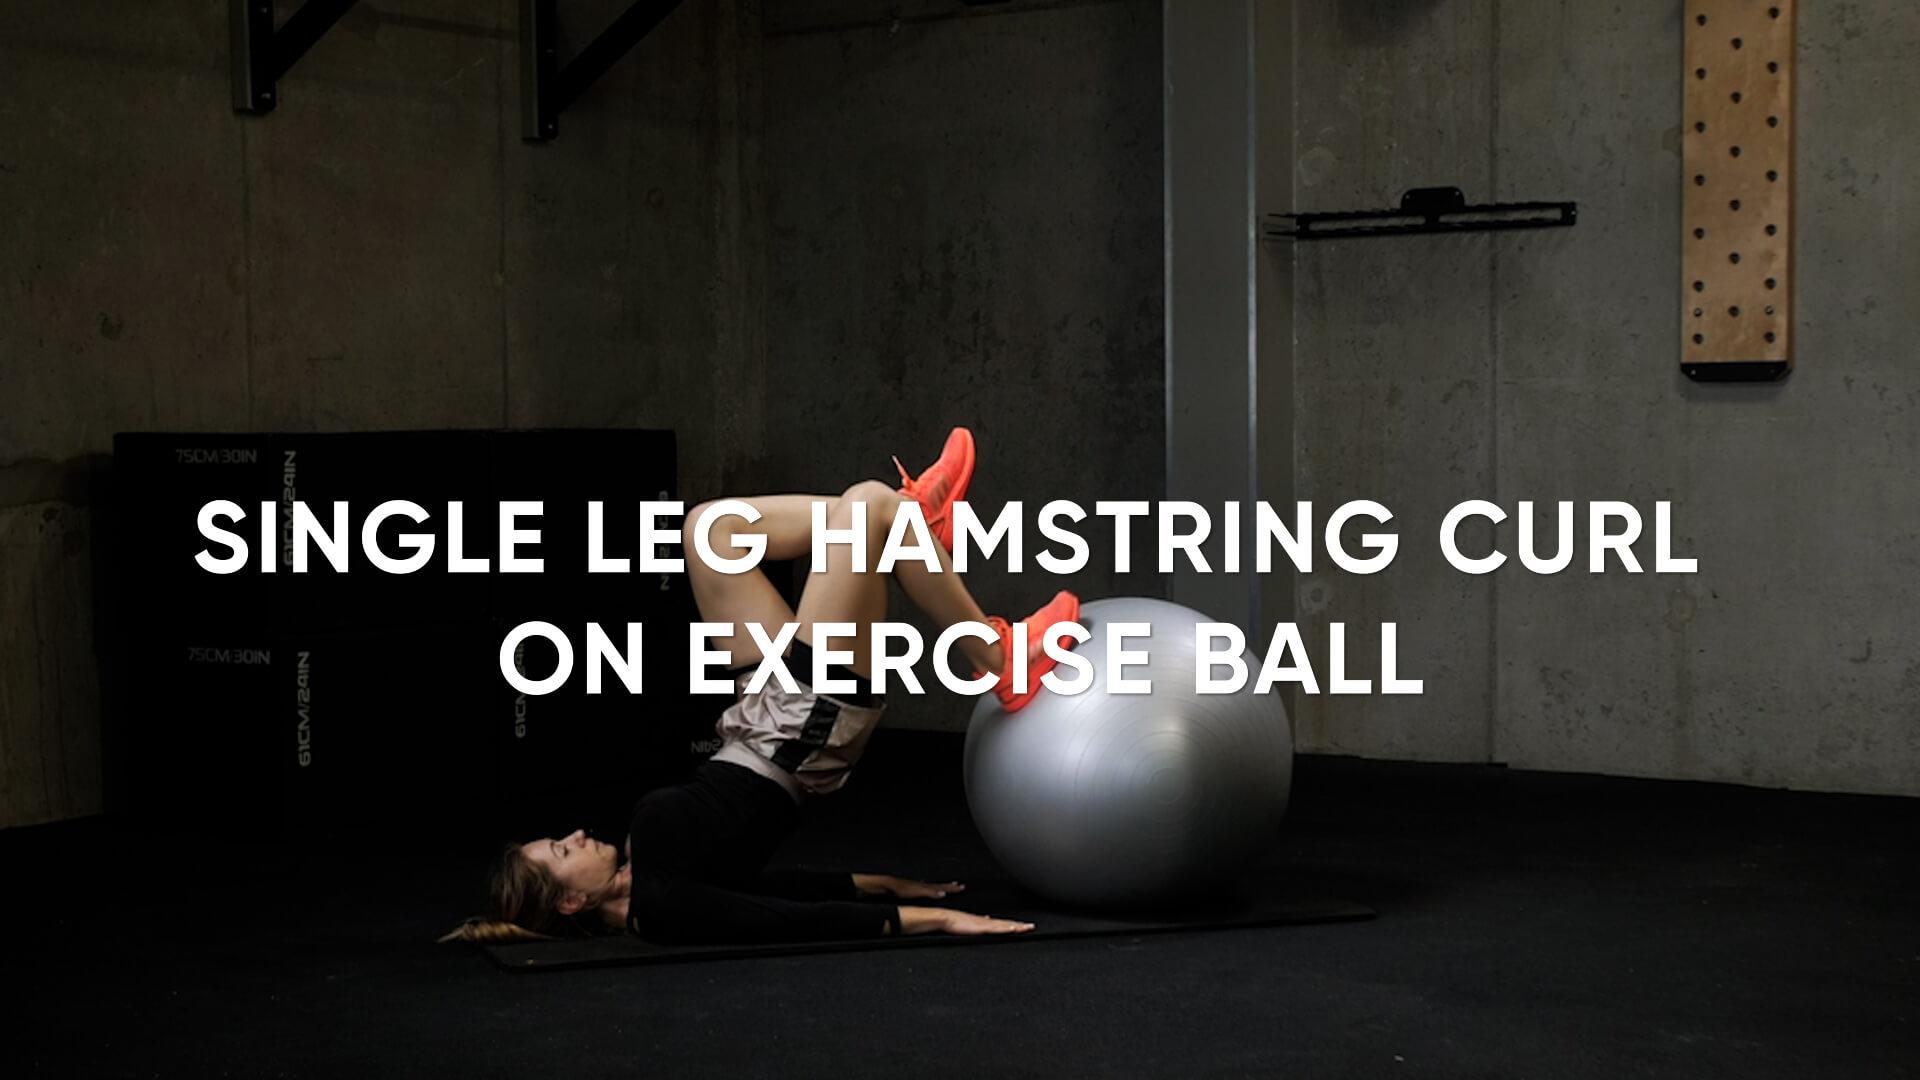 Single Leg Hamstring Curl on Exercise Ball